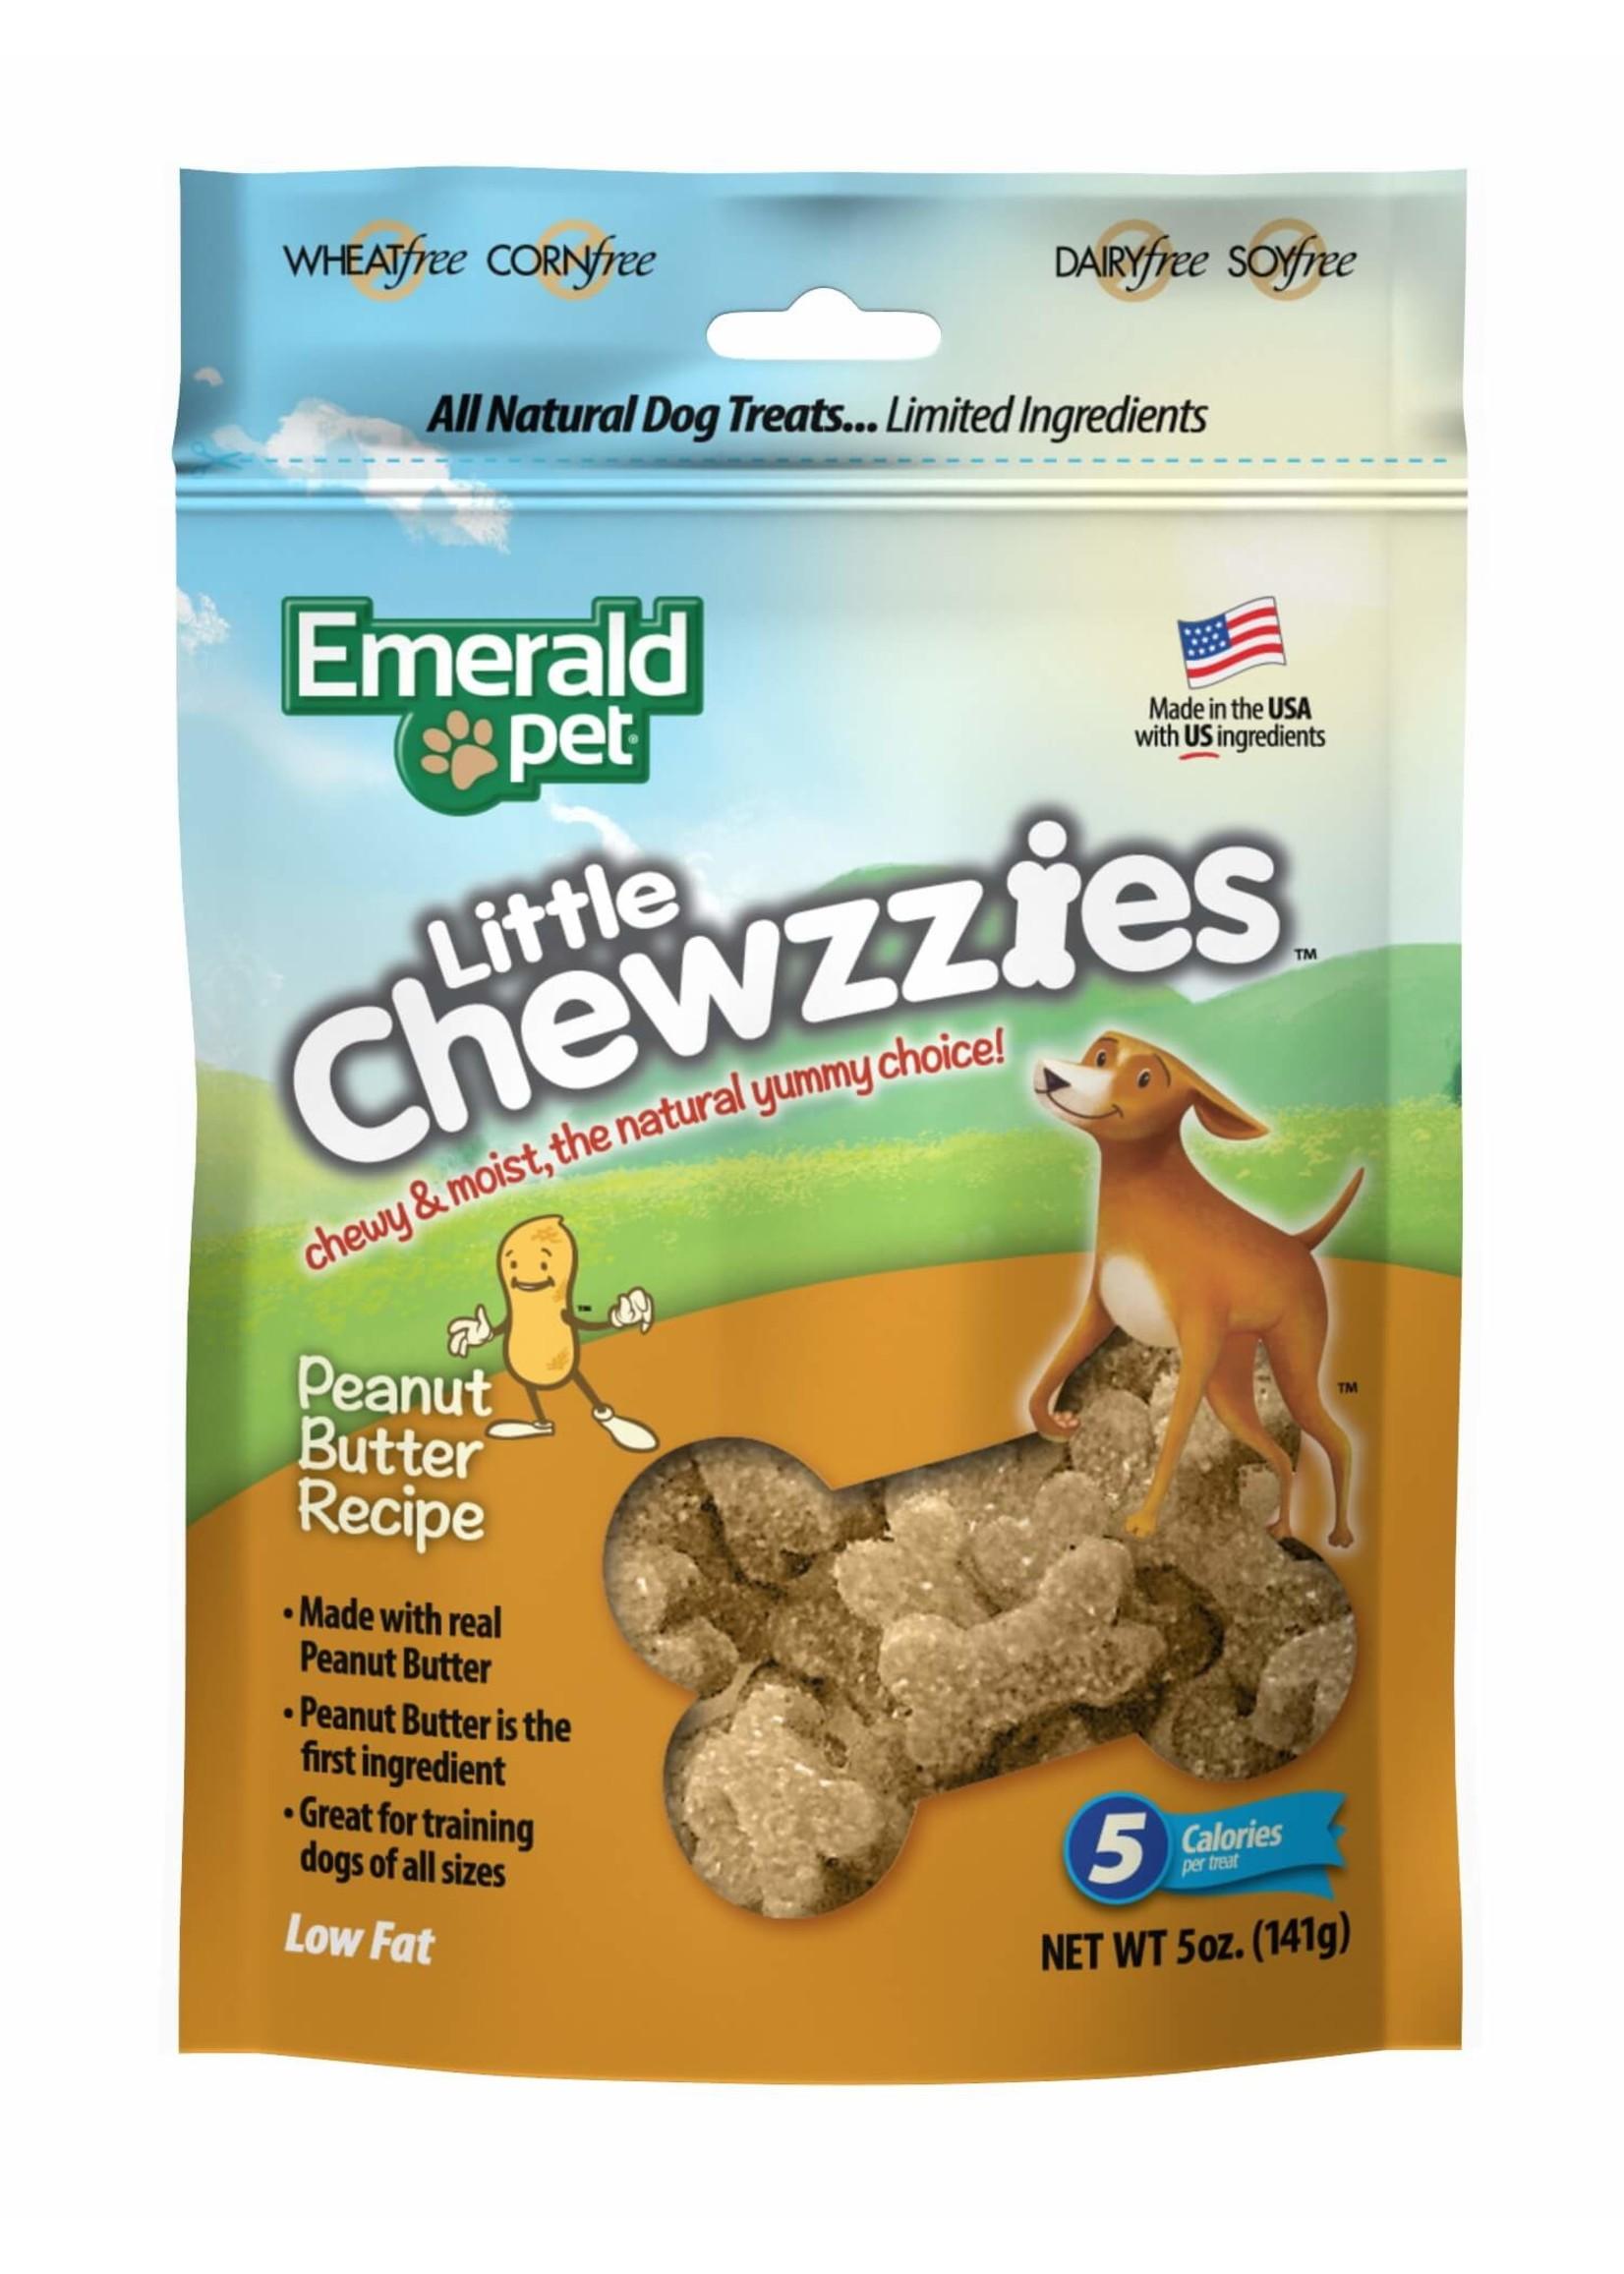 Emerald Pet Emerald Pet Little Chewzzies Chicken Salmon Turducky Peanut Butter 5 oz